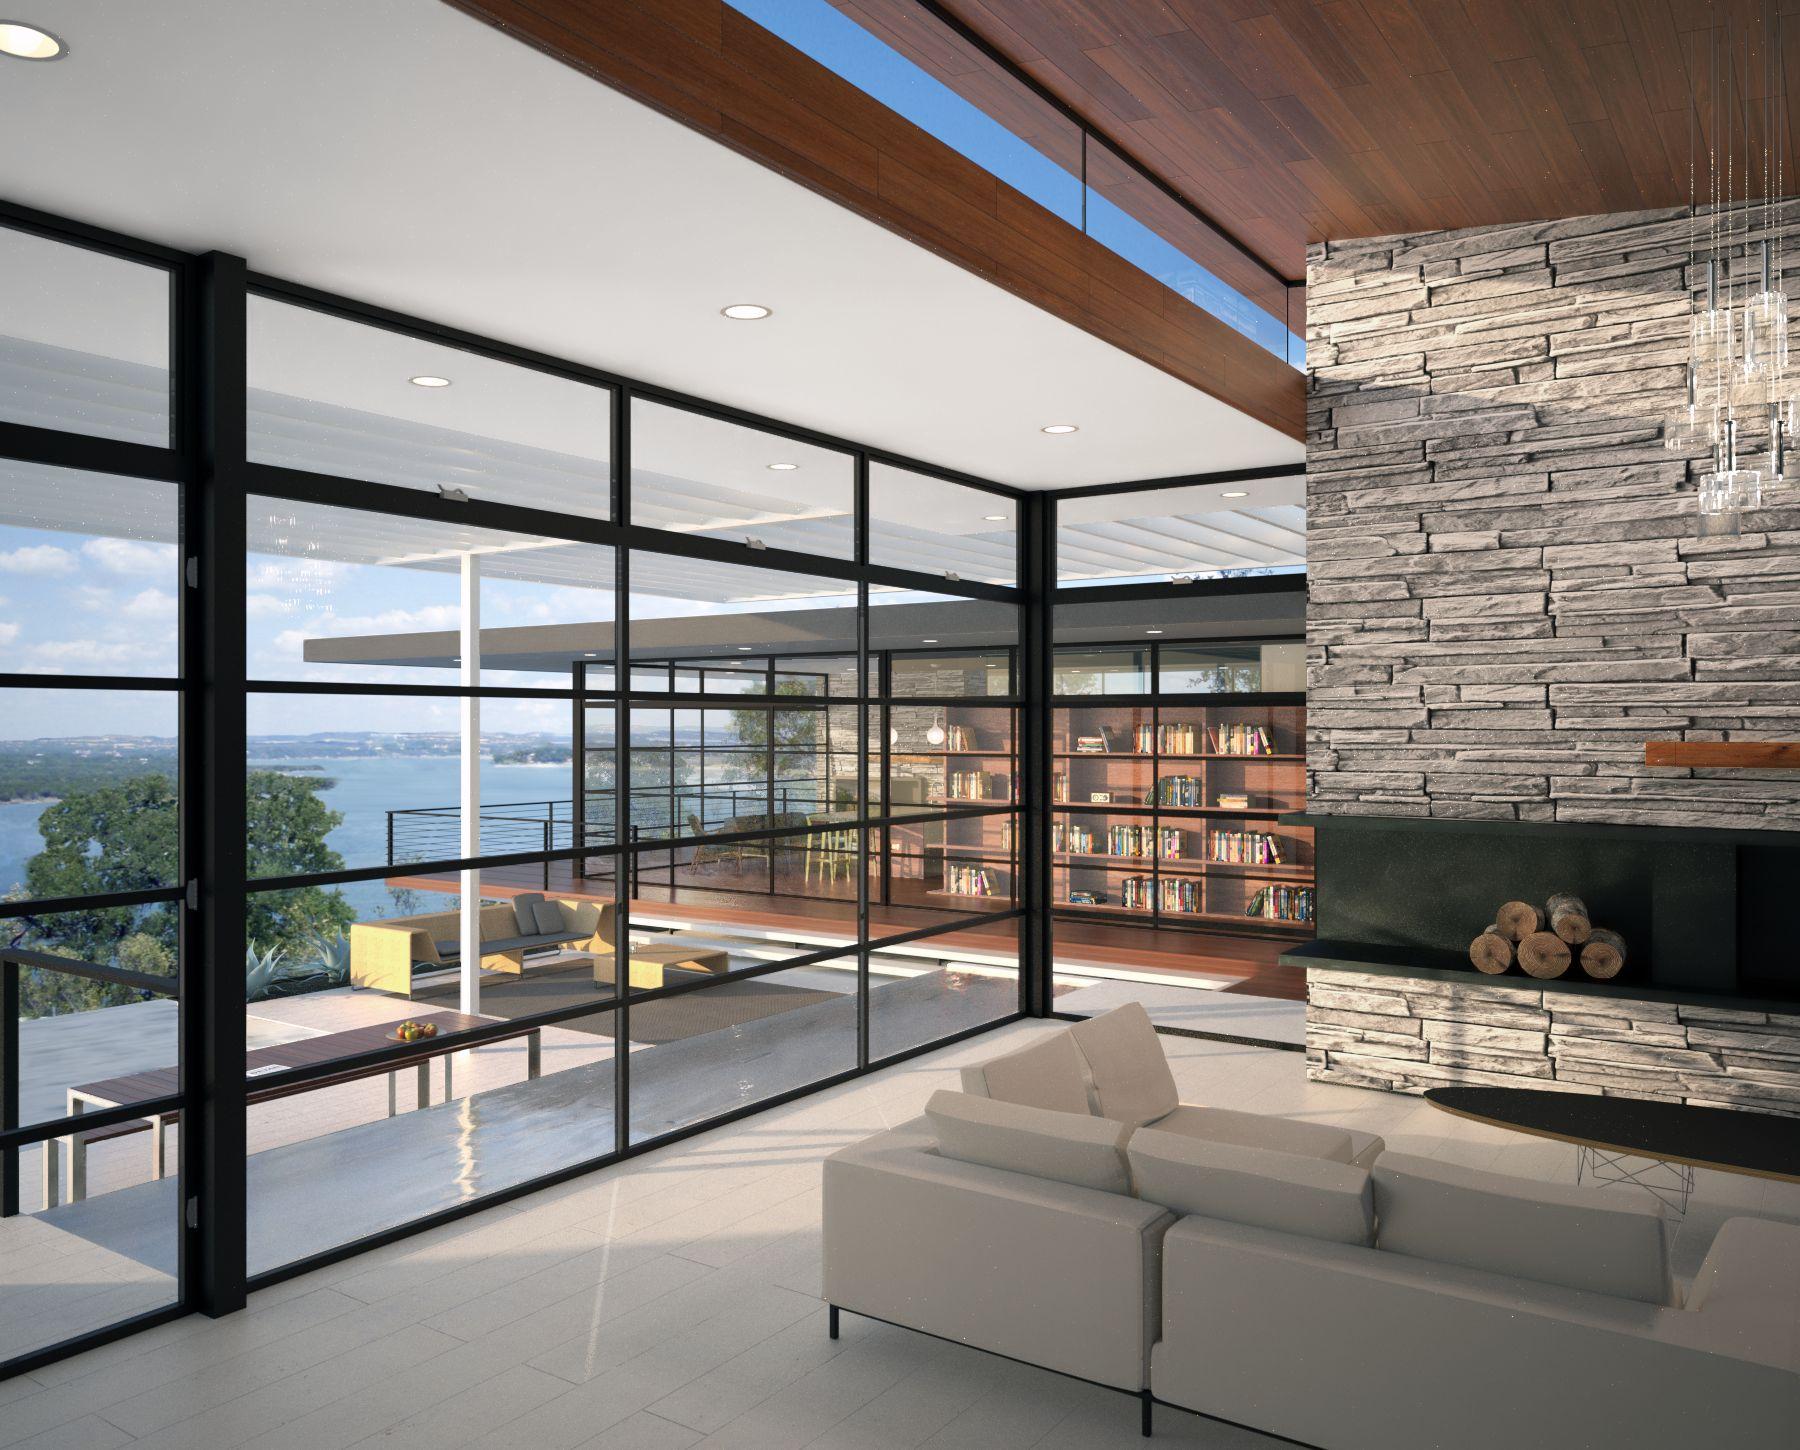 Foursquare Builders - Lake Travis Home Builders